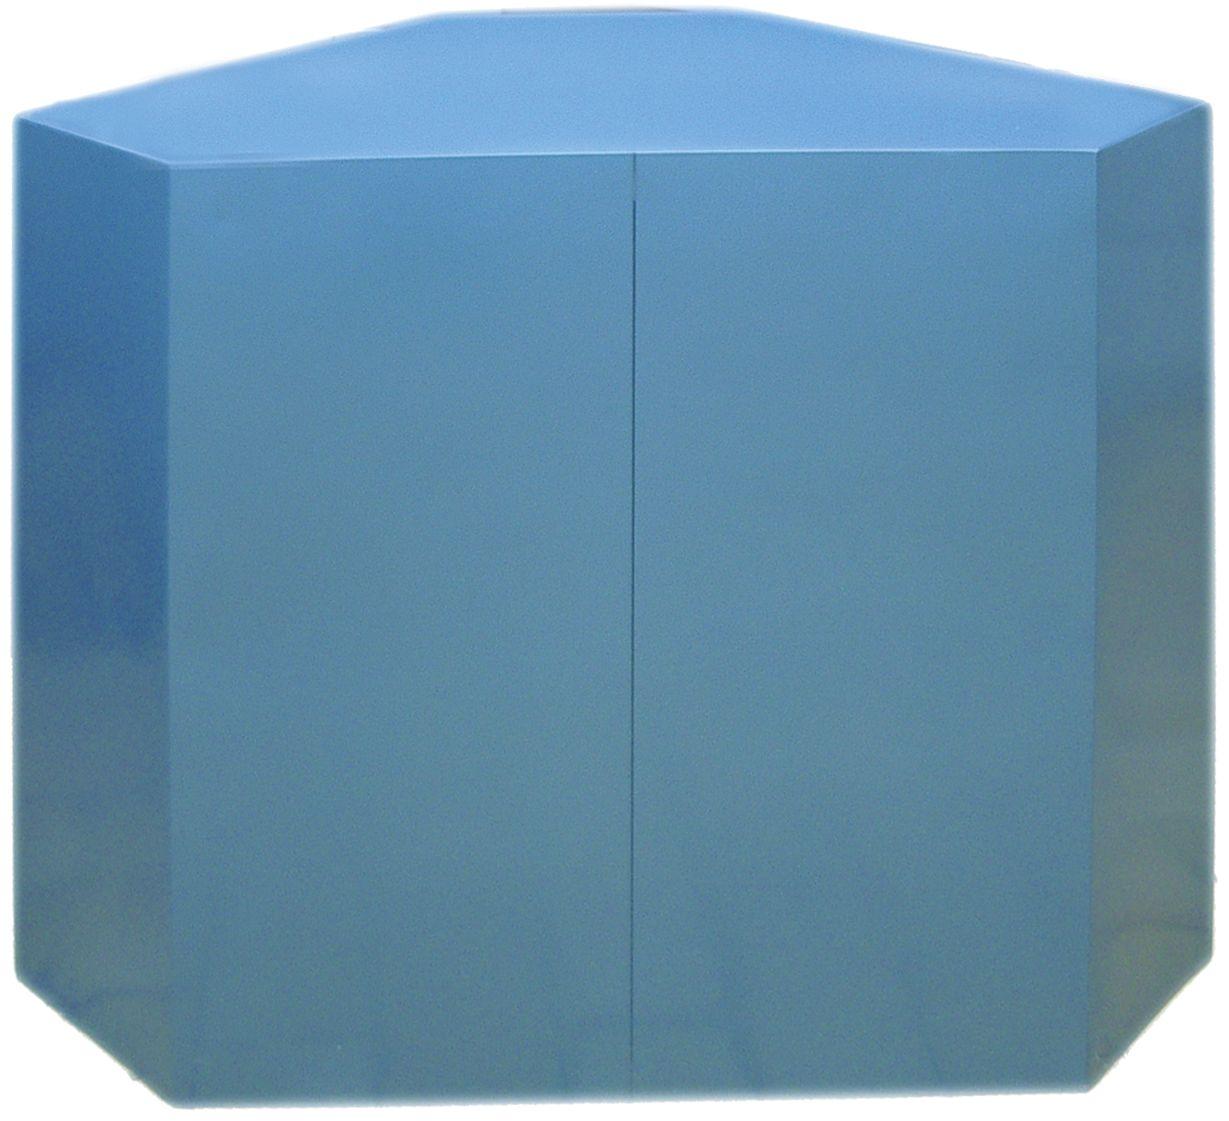 armoire coin armoire tiroirs mobilier d 39 atelier torros. Black Bedroom Furniture Sets. Home Design Ideas